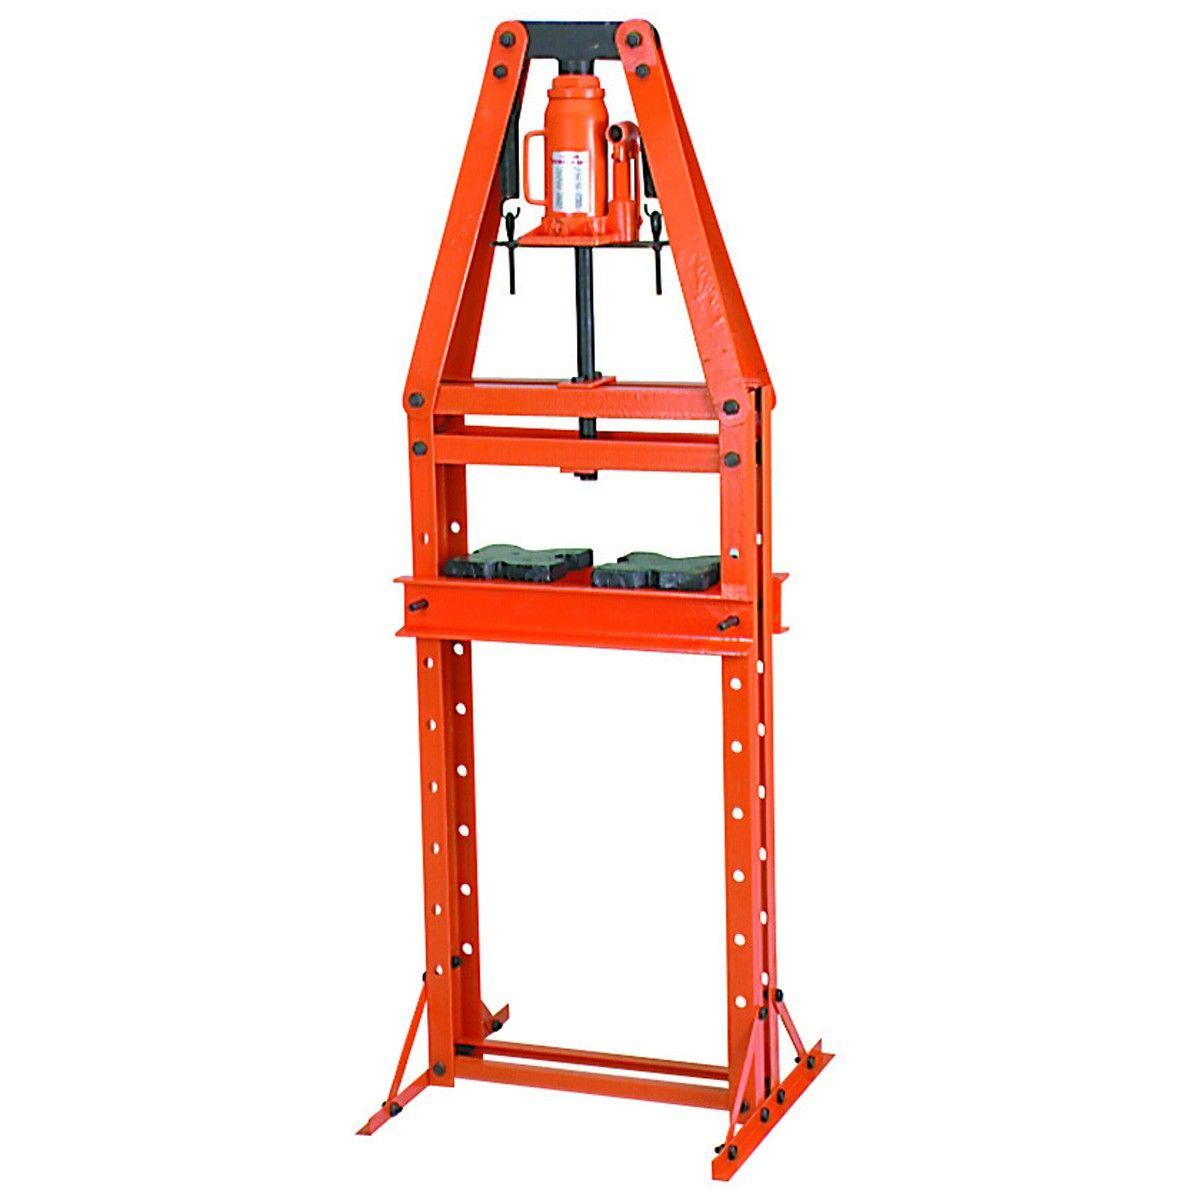 Heavy Duty A Frame : Ton a frame industrial heavy duty floor shop press